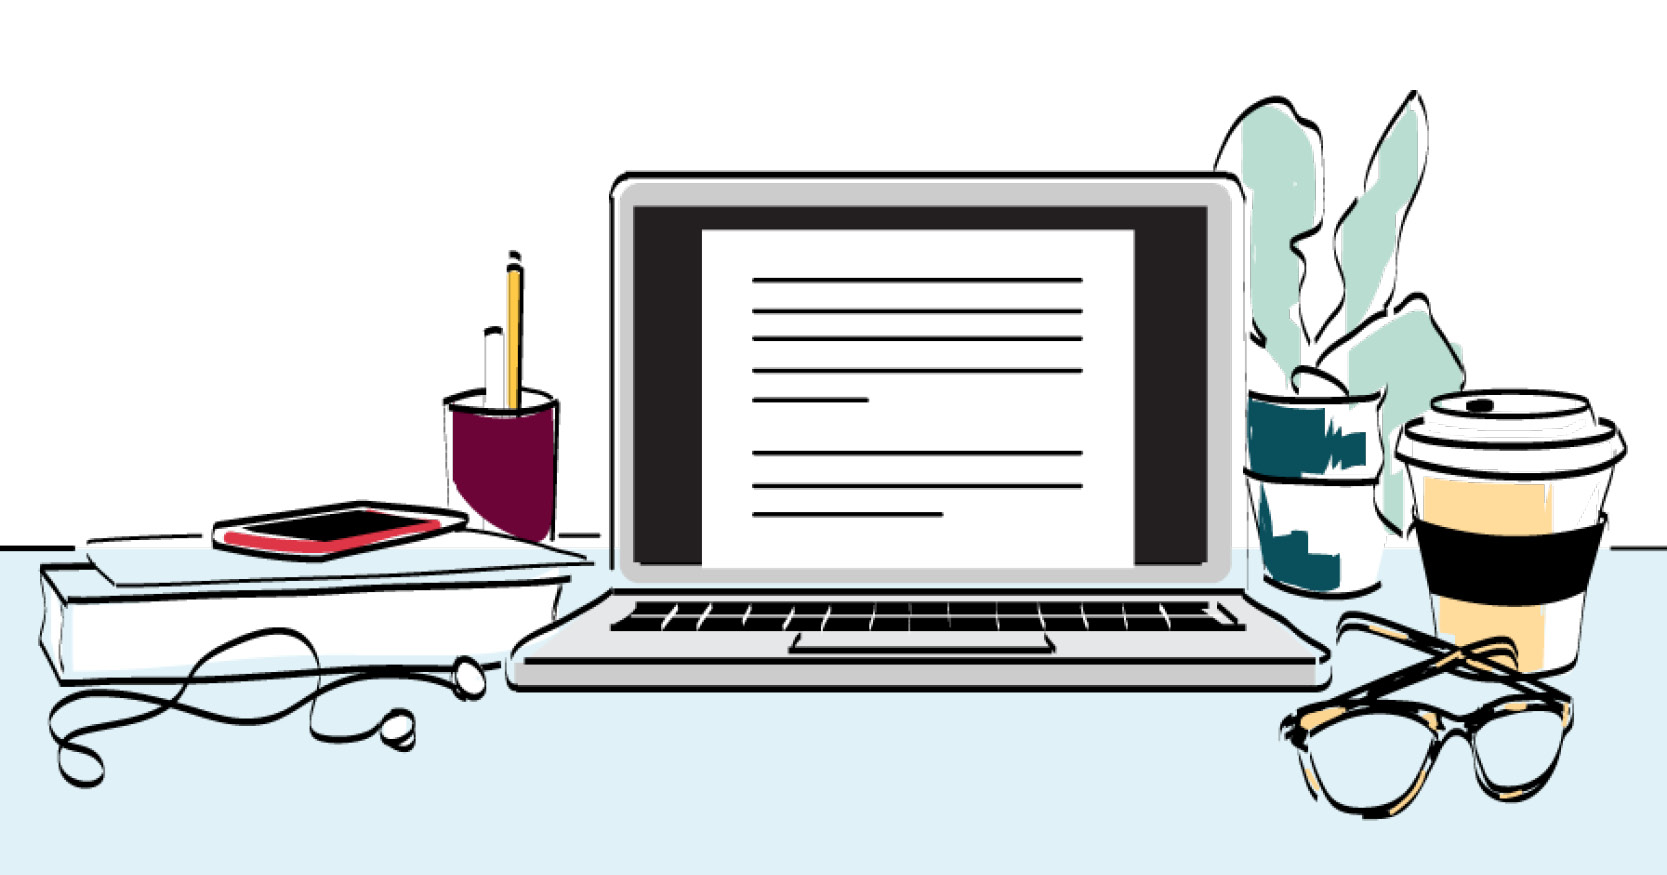 study materials on a desk